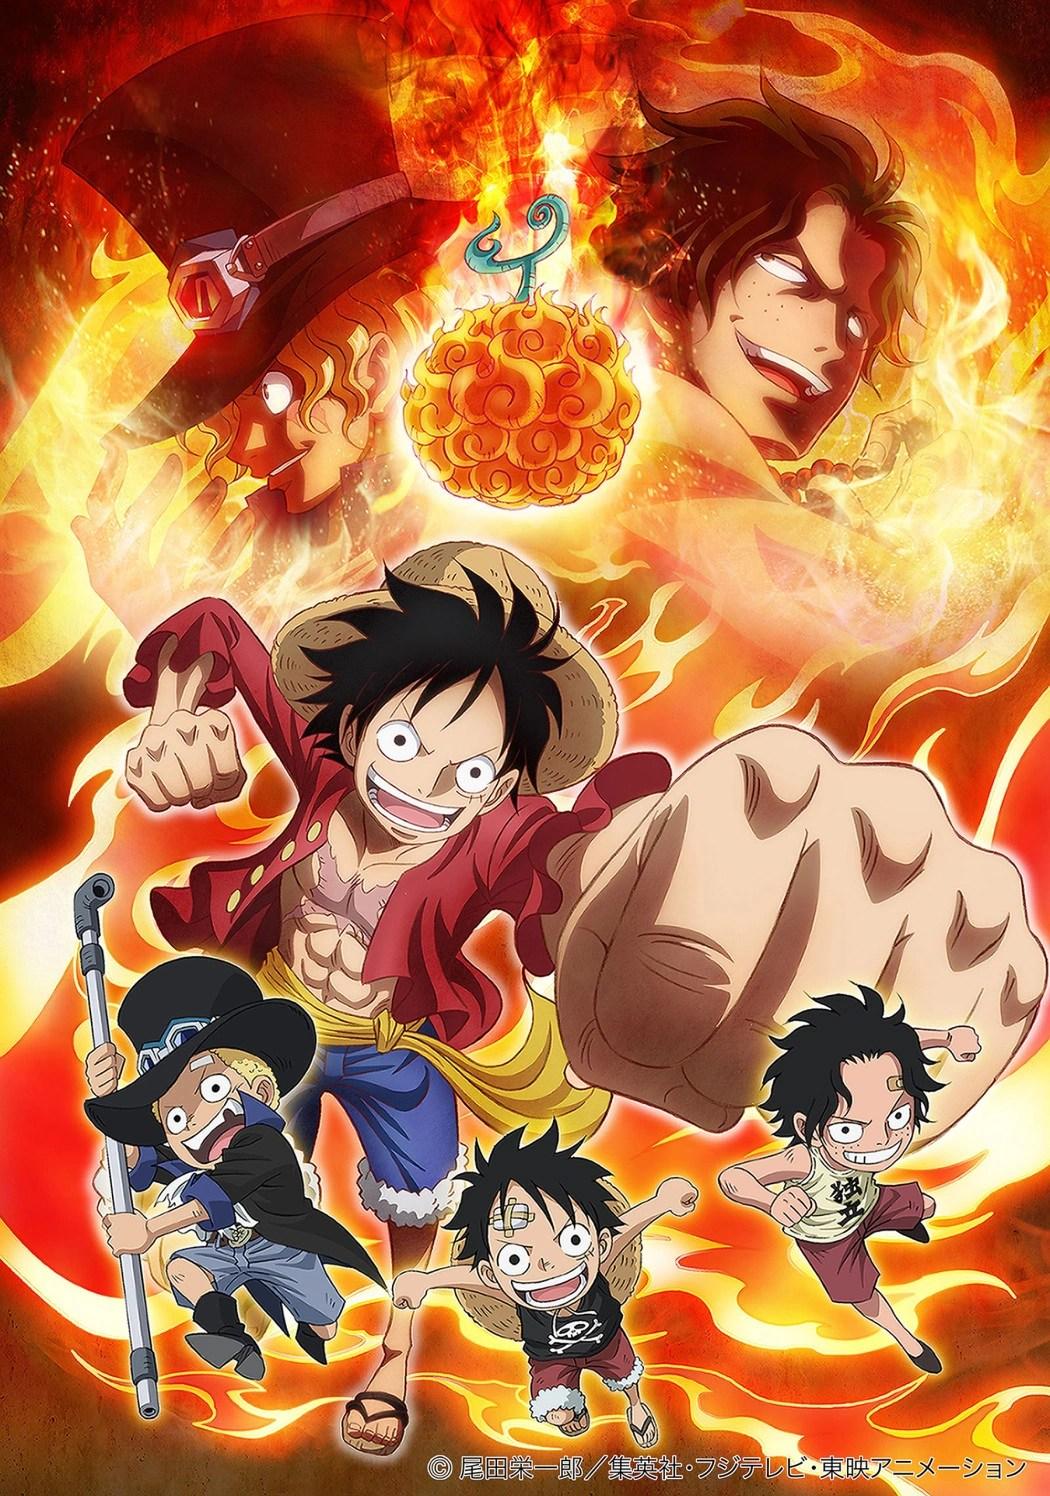 One Piece - Episode 867 Vostfr : piece, episode, vostfr, Episode, Piece, Fandom